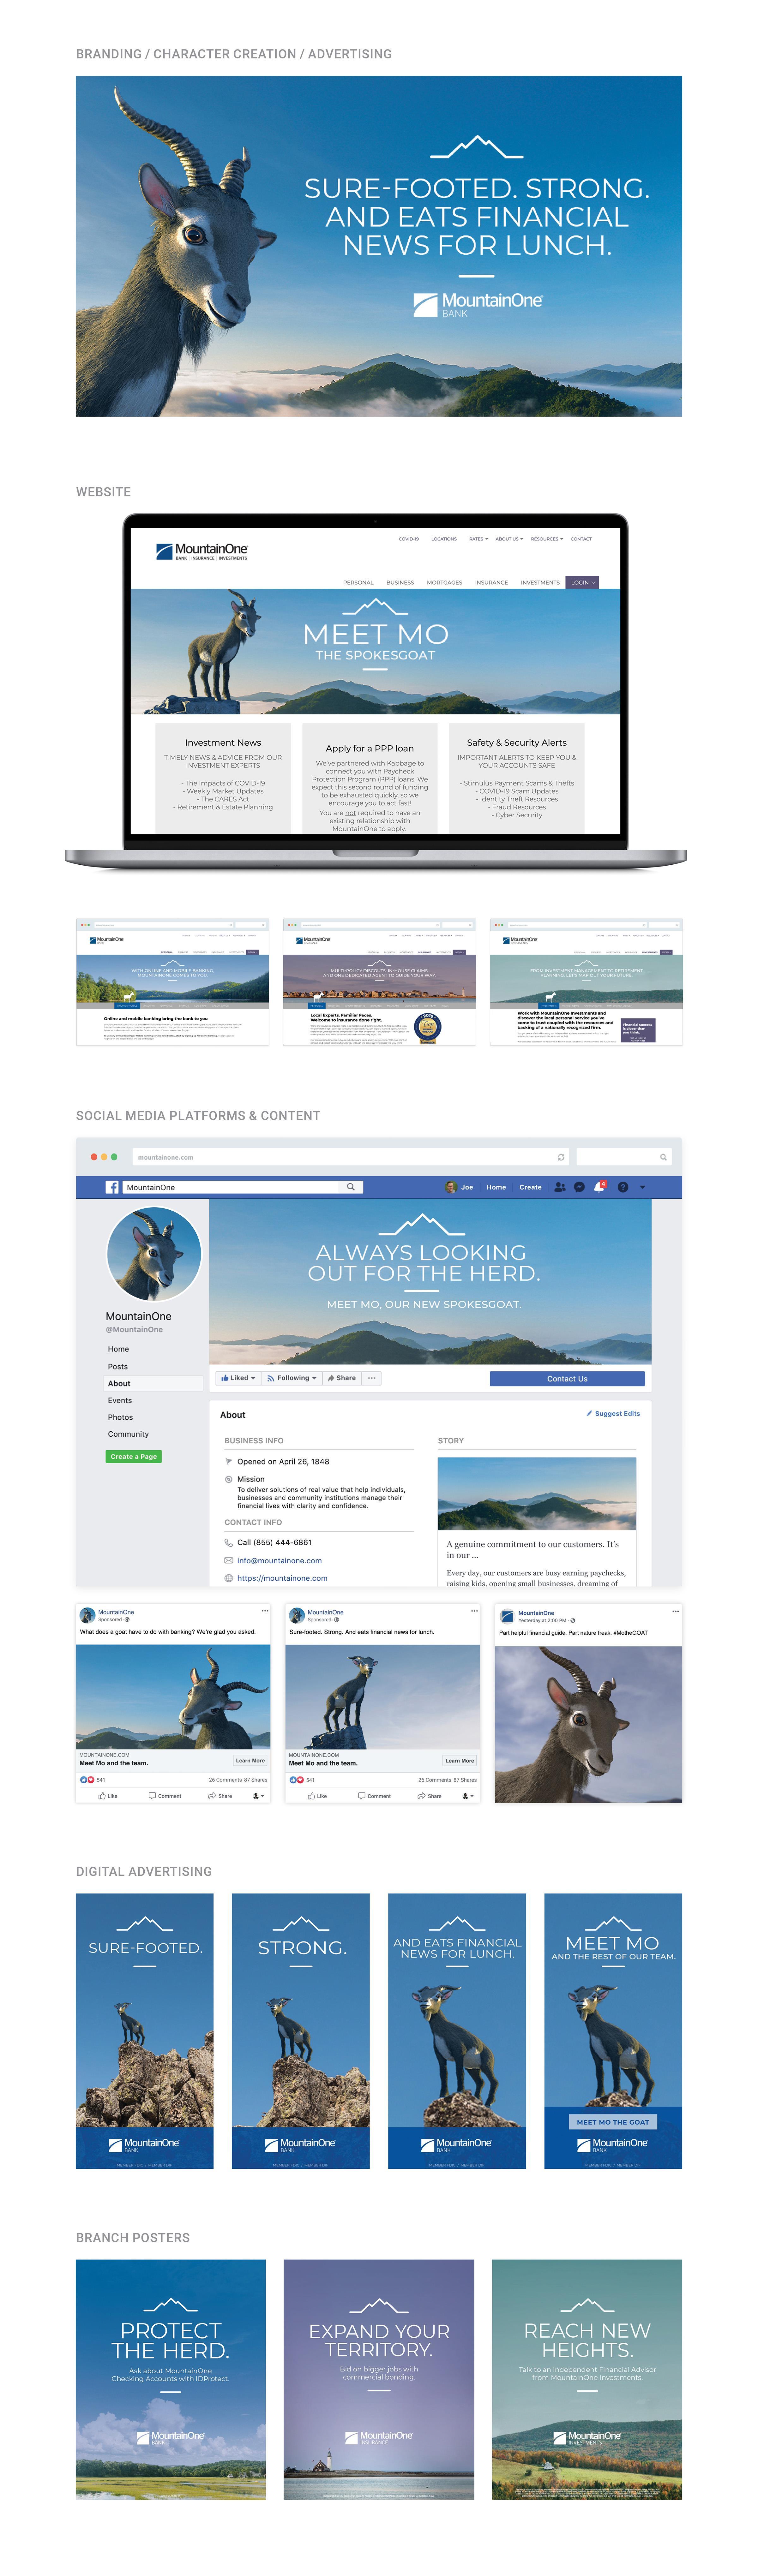 MountainOne Bank Branding & Advertising